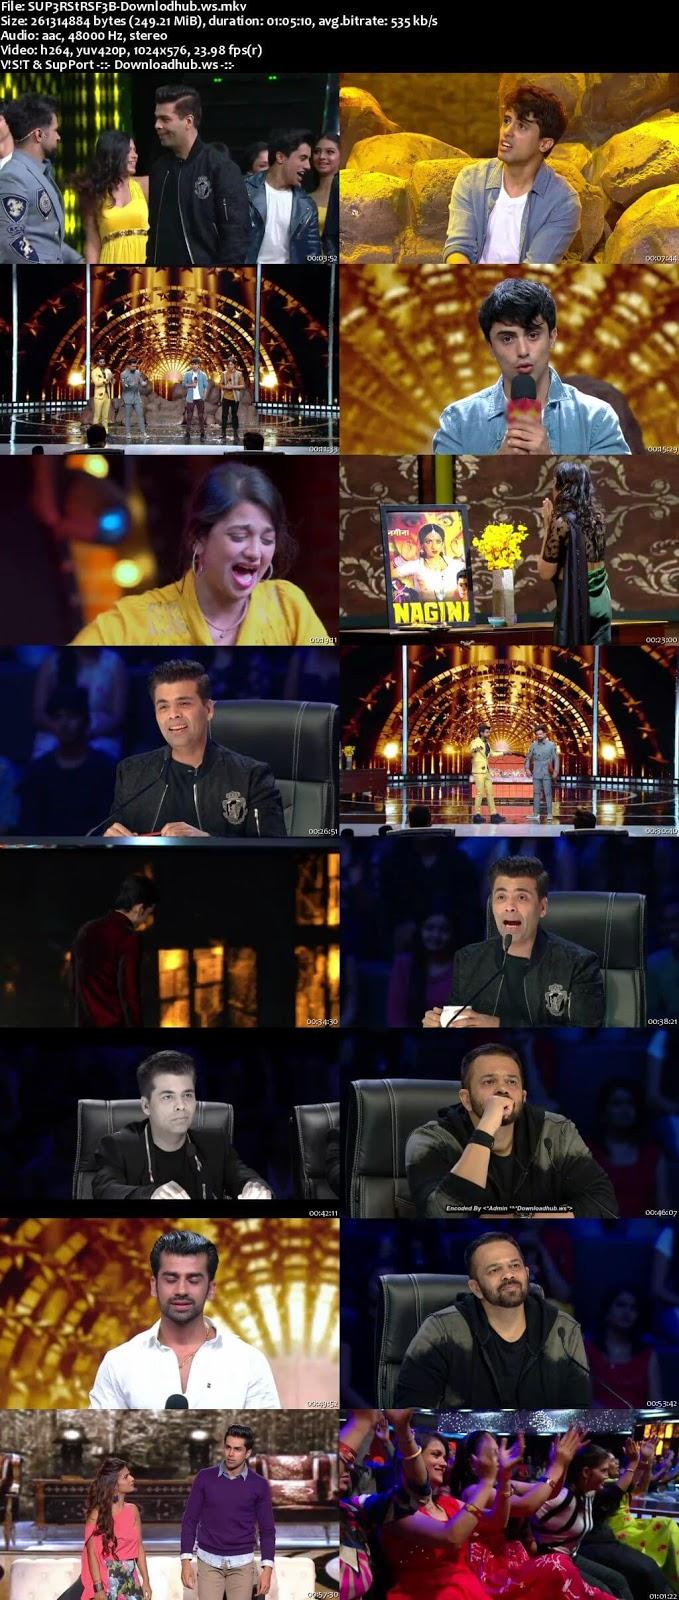 India's Next Superstars 03 February 2018 Episode 07 HDTV 480p